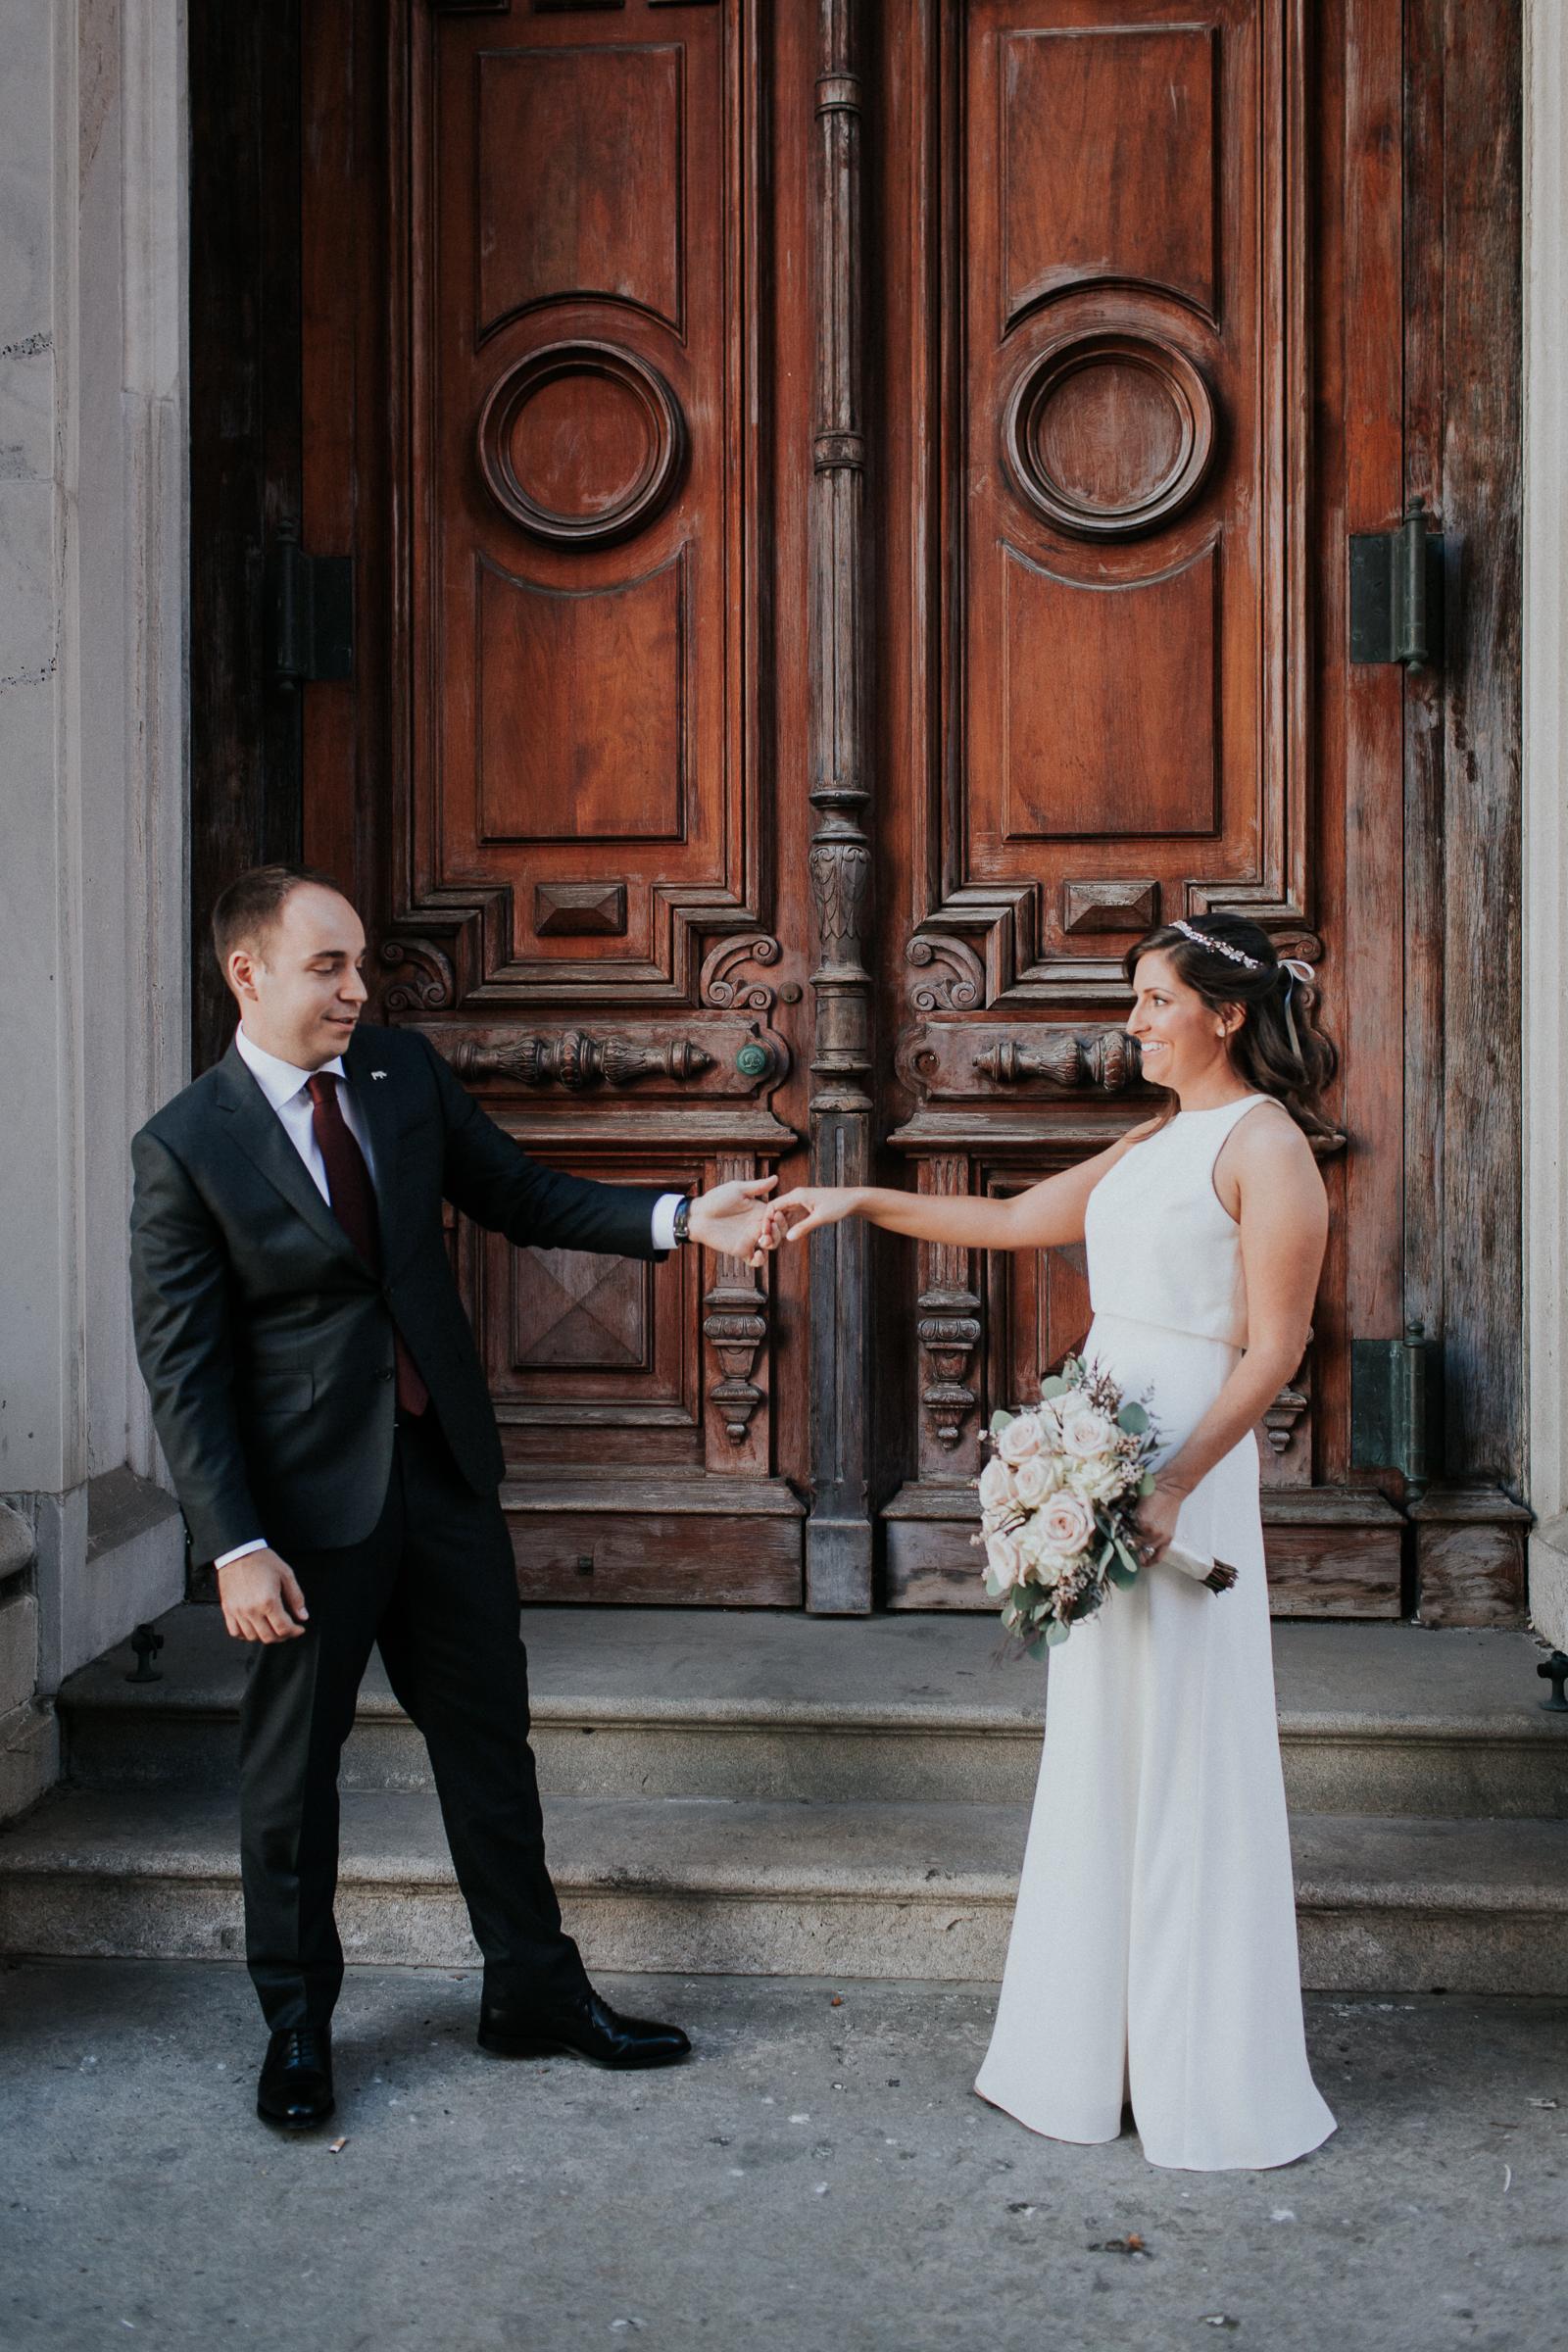 Casa-Apicii-Intimate-Wedding-City-Hall-Elopement-New-York-Documentary-Wedding-Photographer-20.jpg